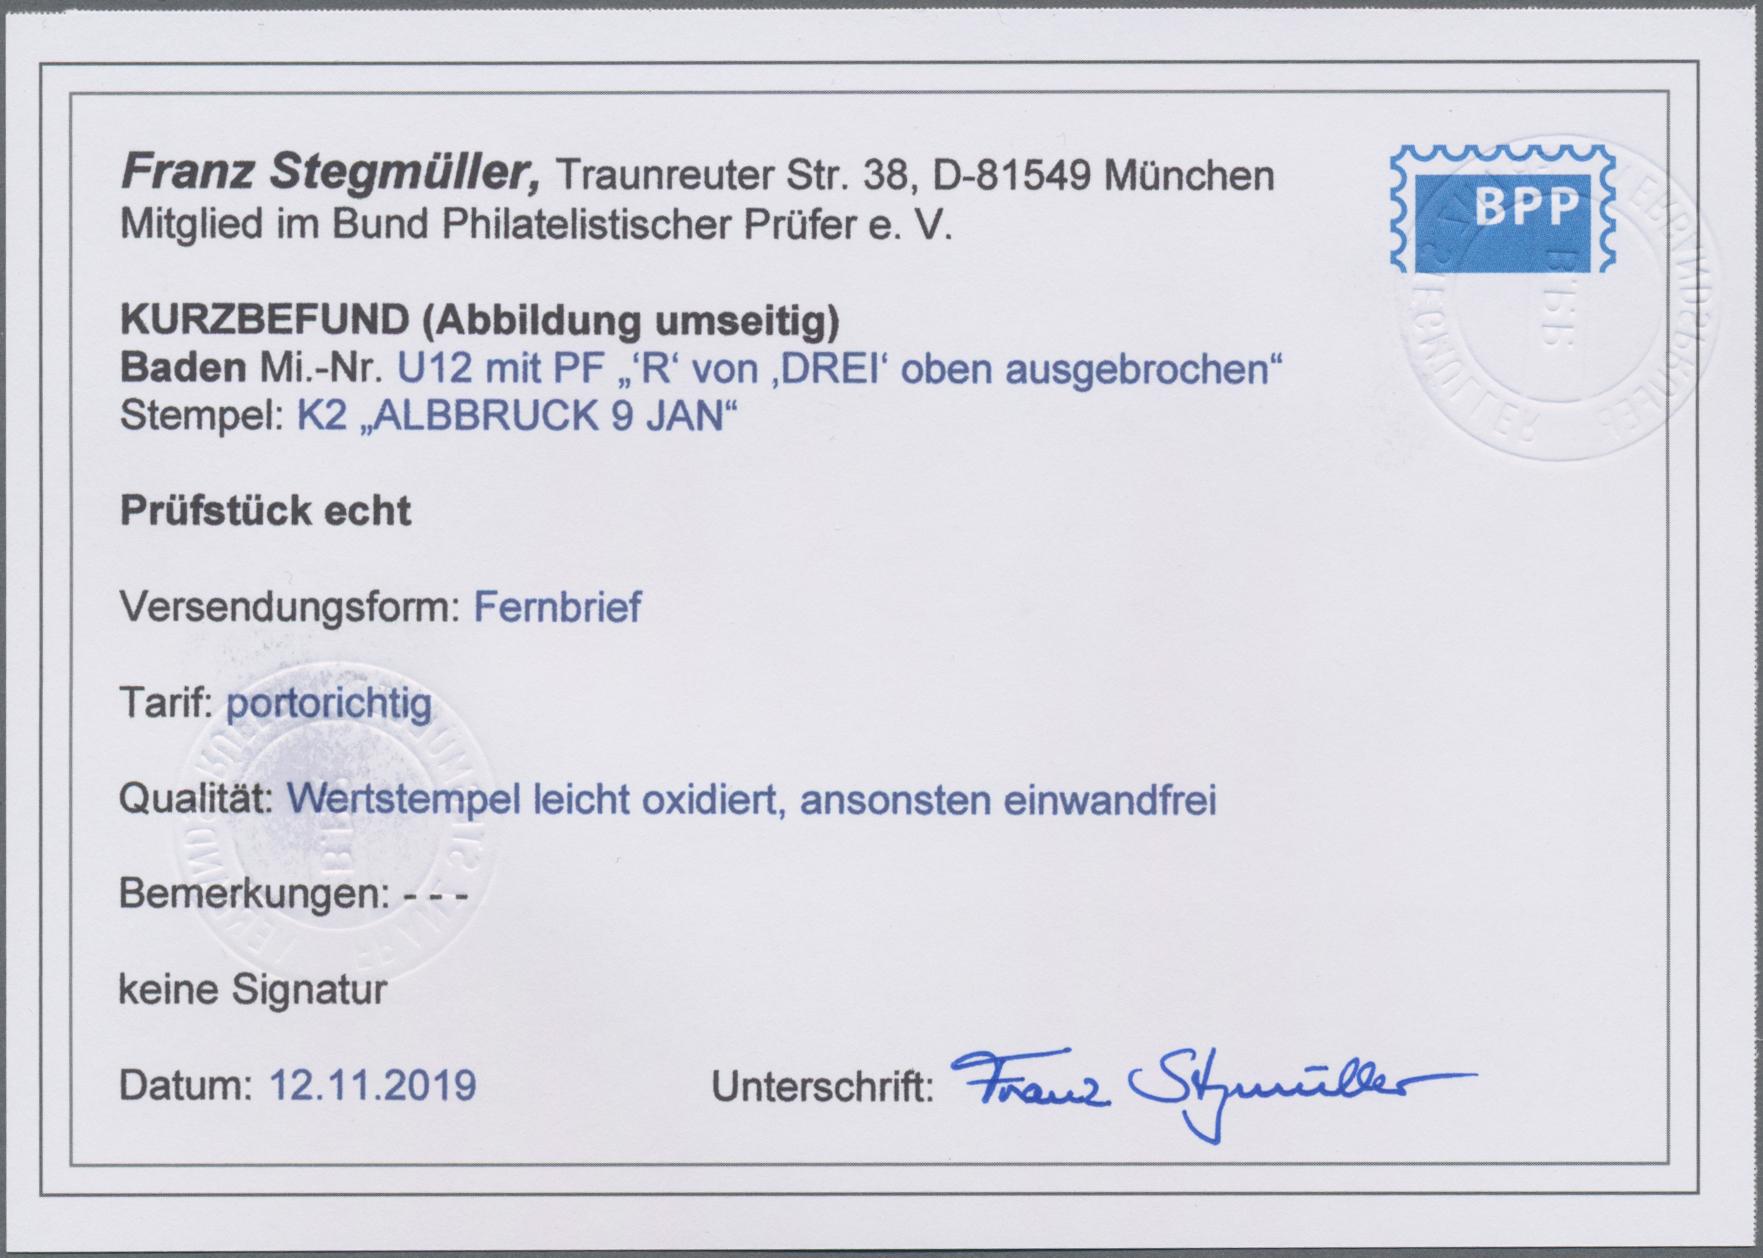 Lot 05016 - Baden - Ganzsachen  -  Auktionshaus Christoph Gärtner GmbH & Co. KG 51th Auction - Day 3